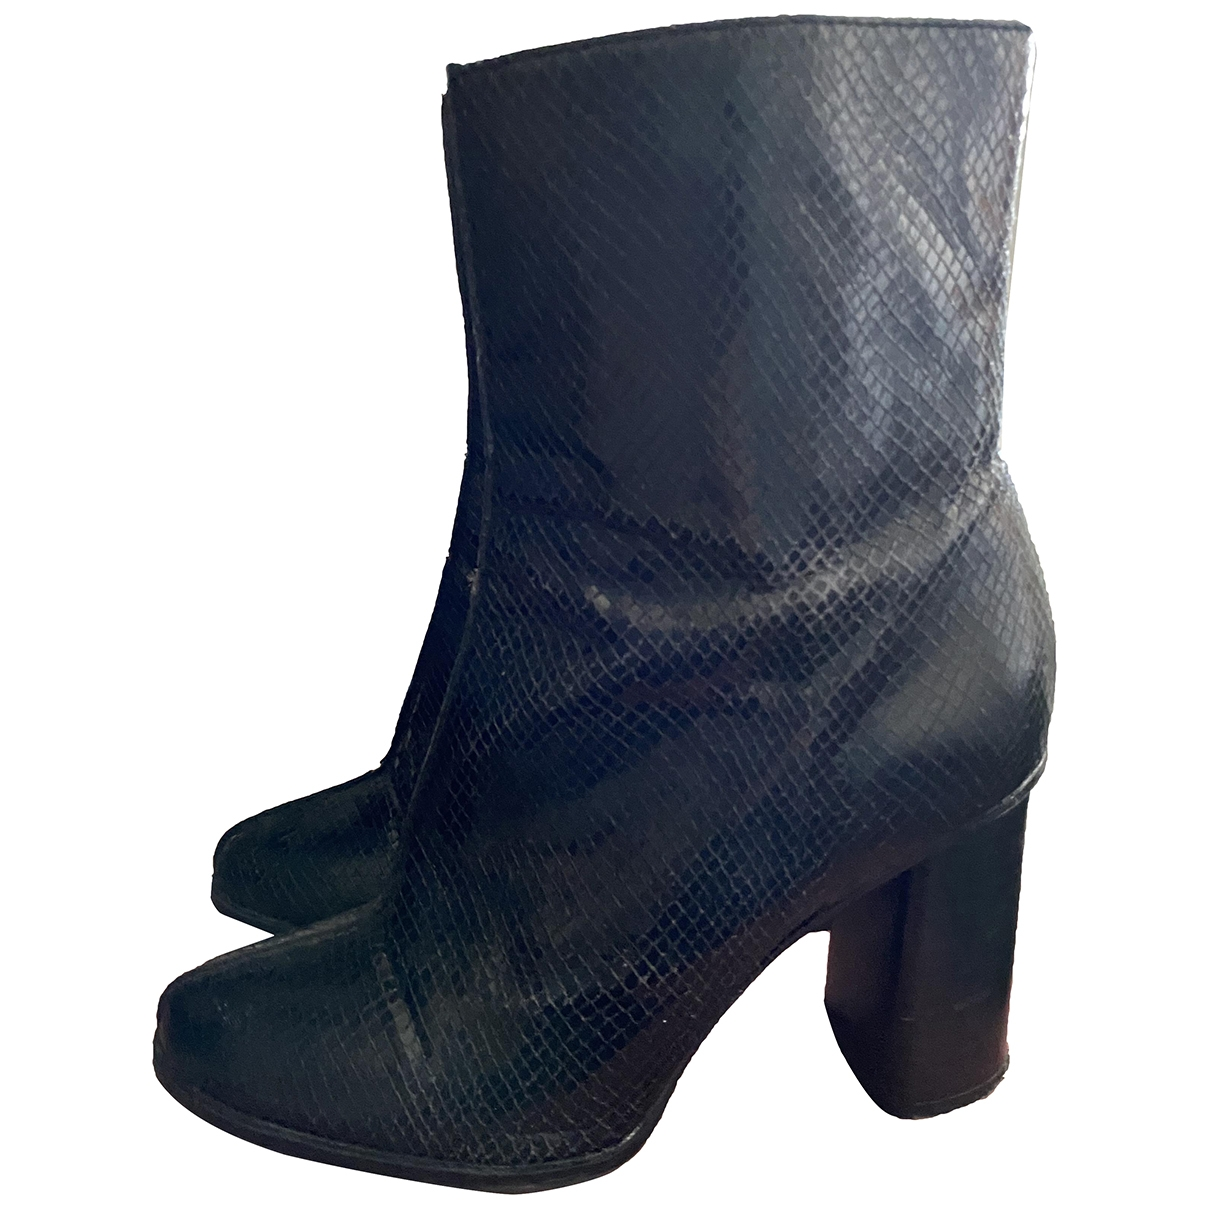 Mango \N Black Patent leather Boots for Women 38 EU